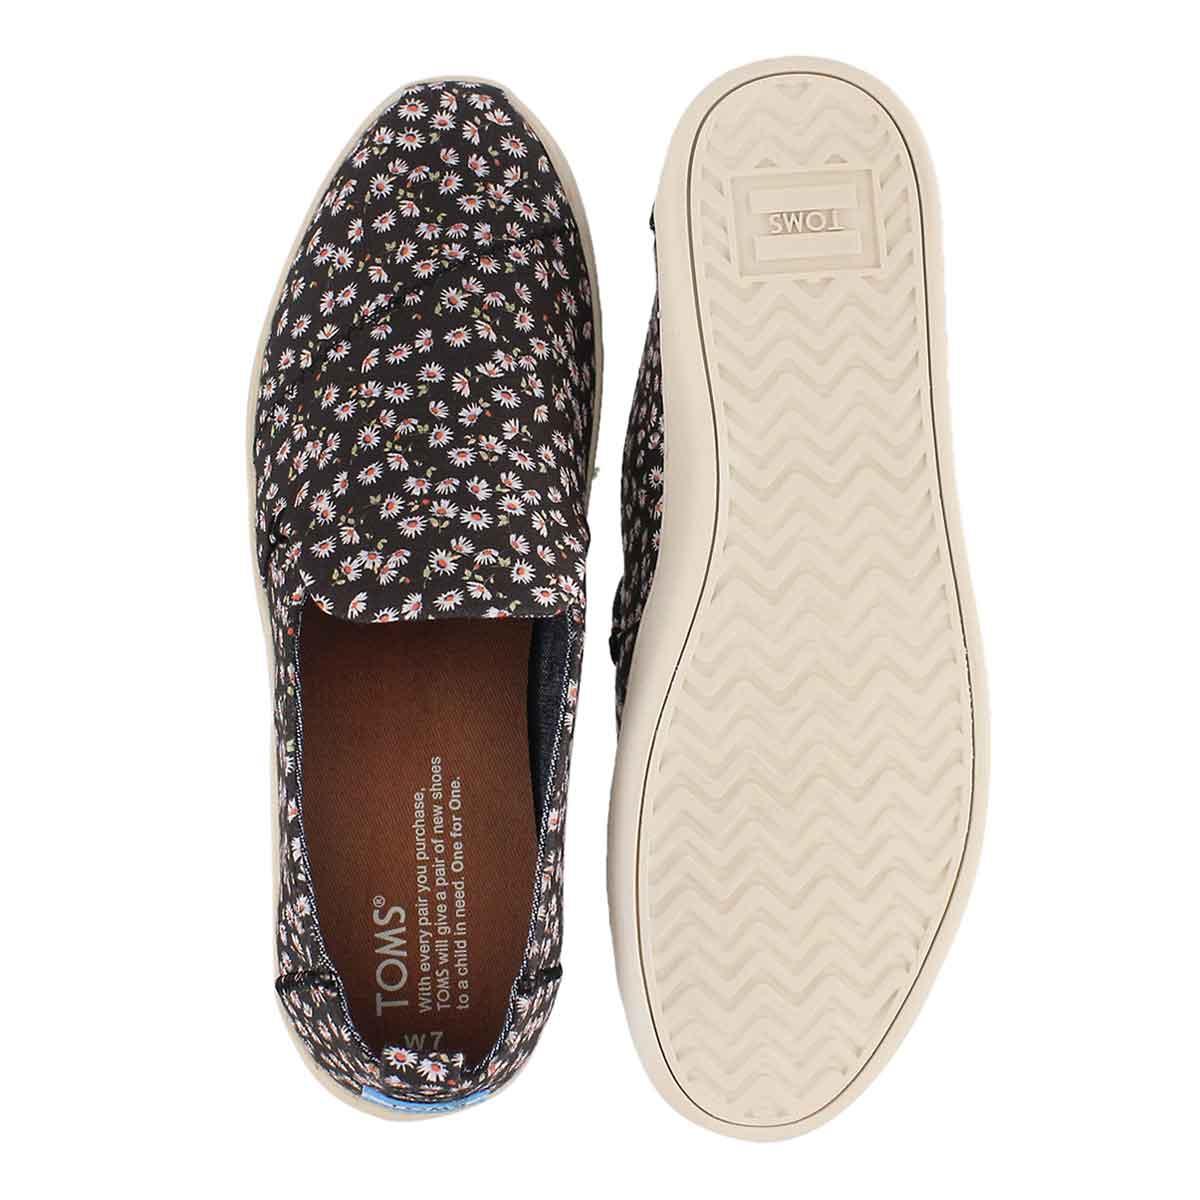 Lds DeconstructedAlpargata bk dsy loafer